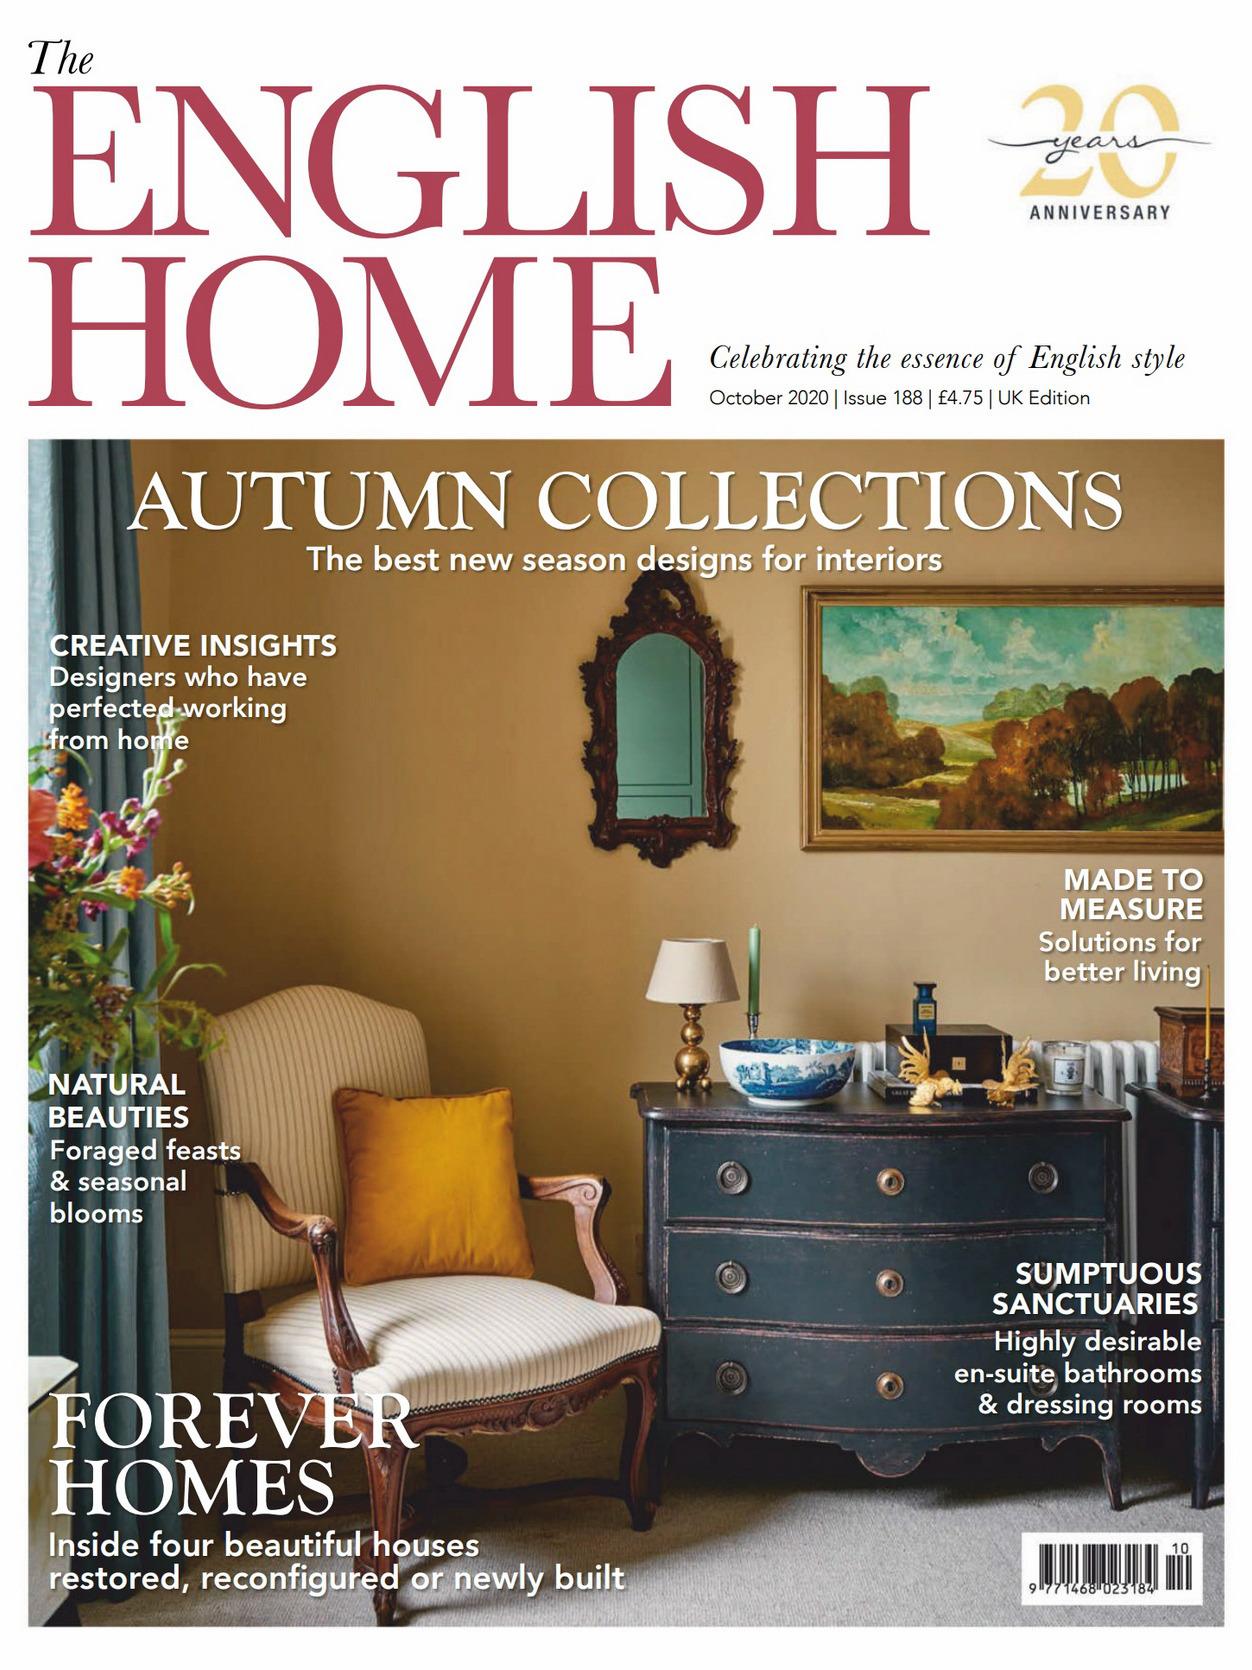 《The English Home》英国版时尚家居杂志2020年10月号